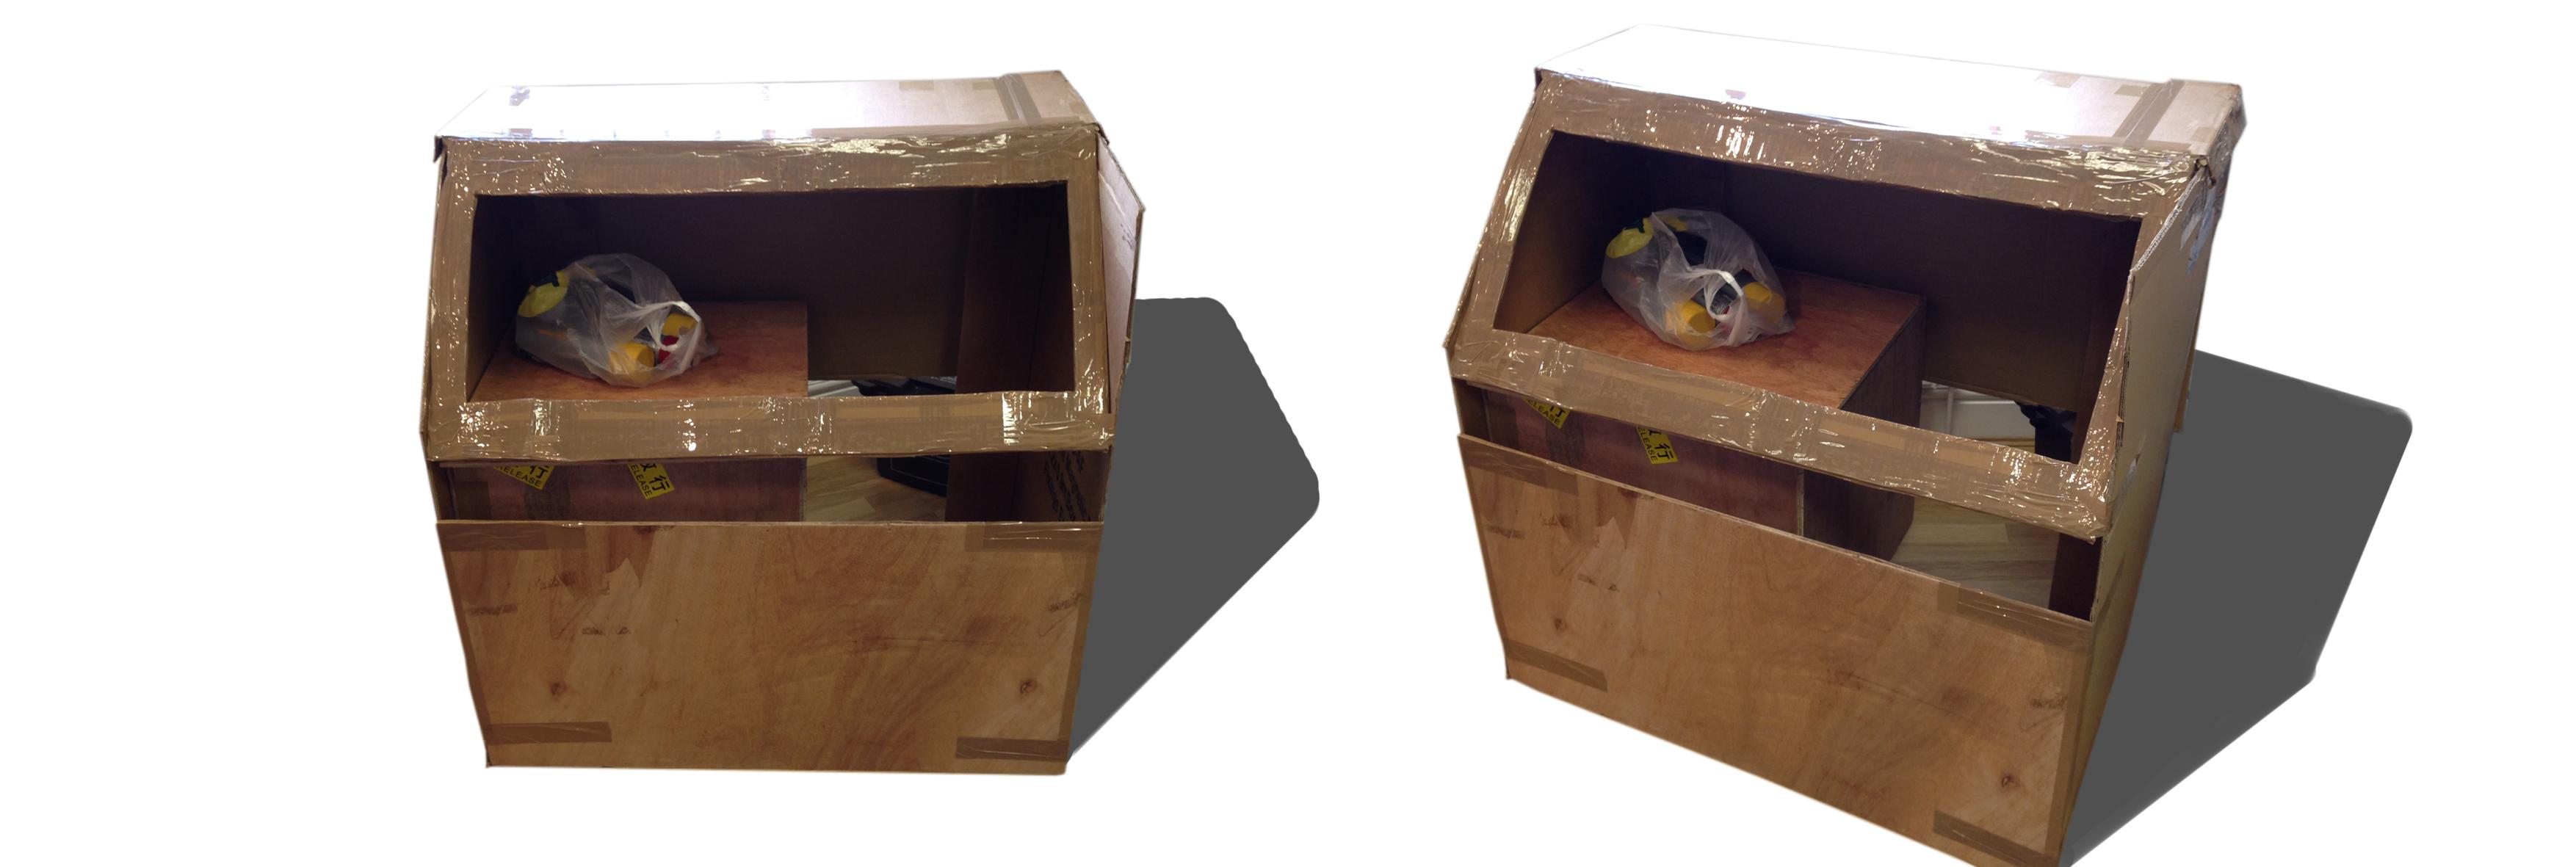 Shopbox Cardboard